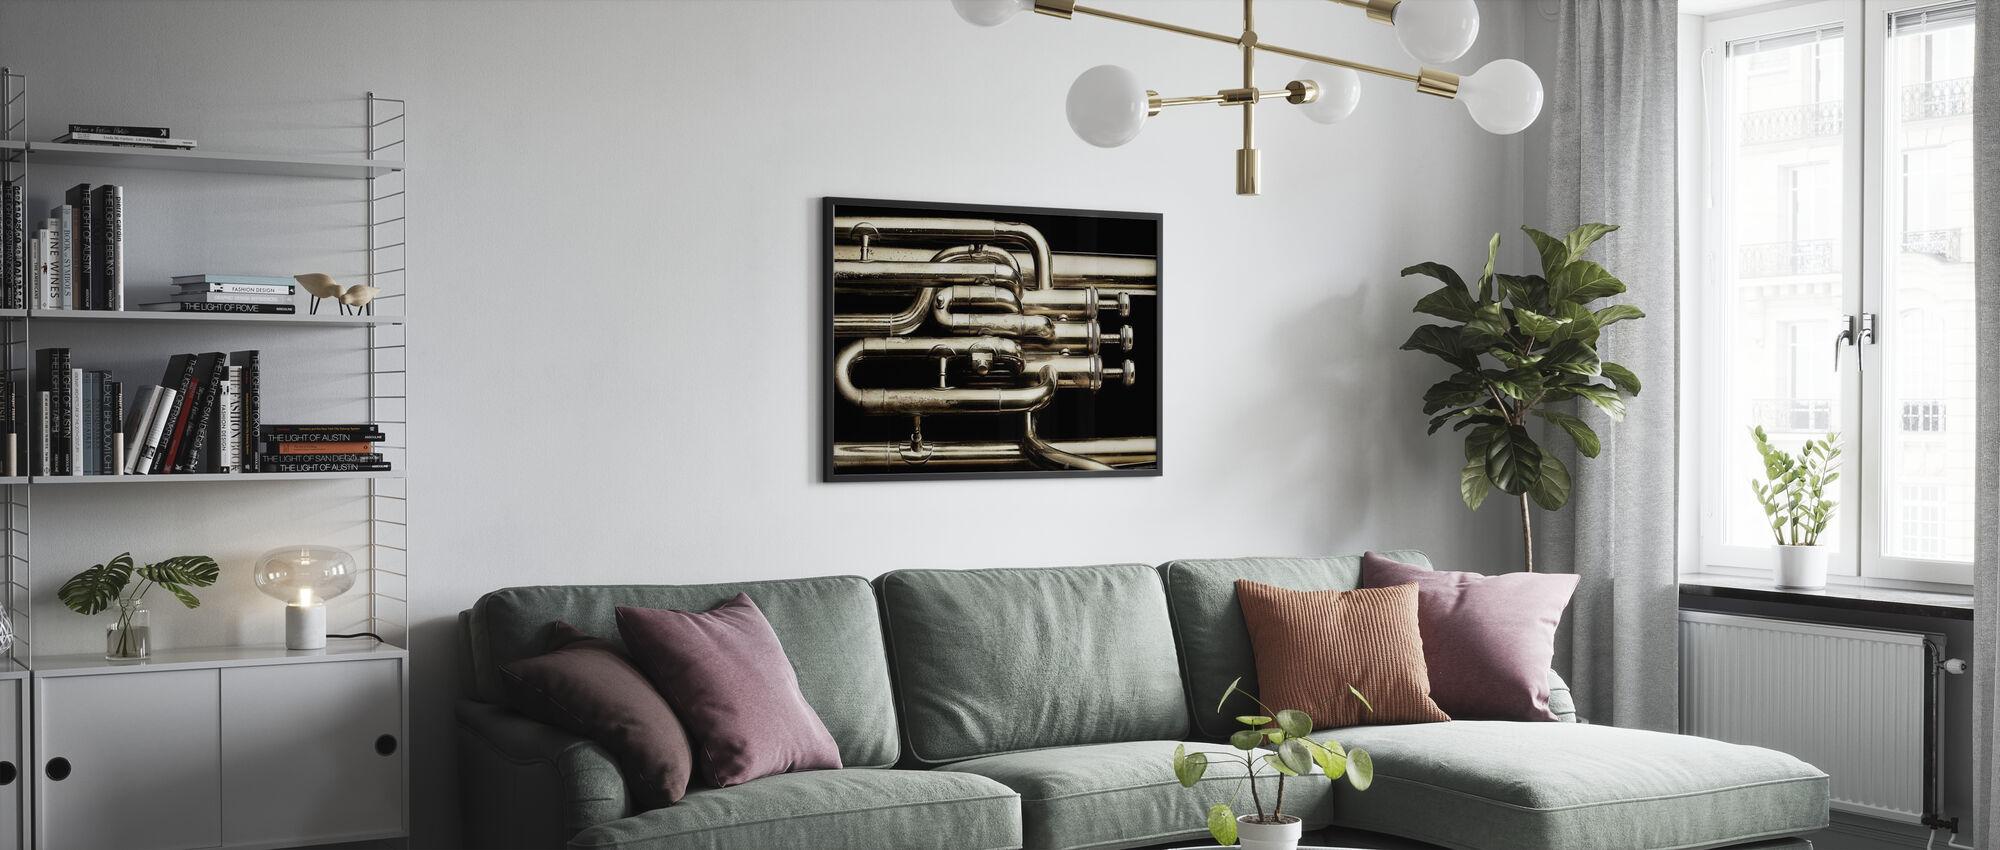 Messing Horn - Plakat - Stue